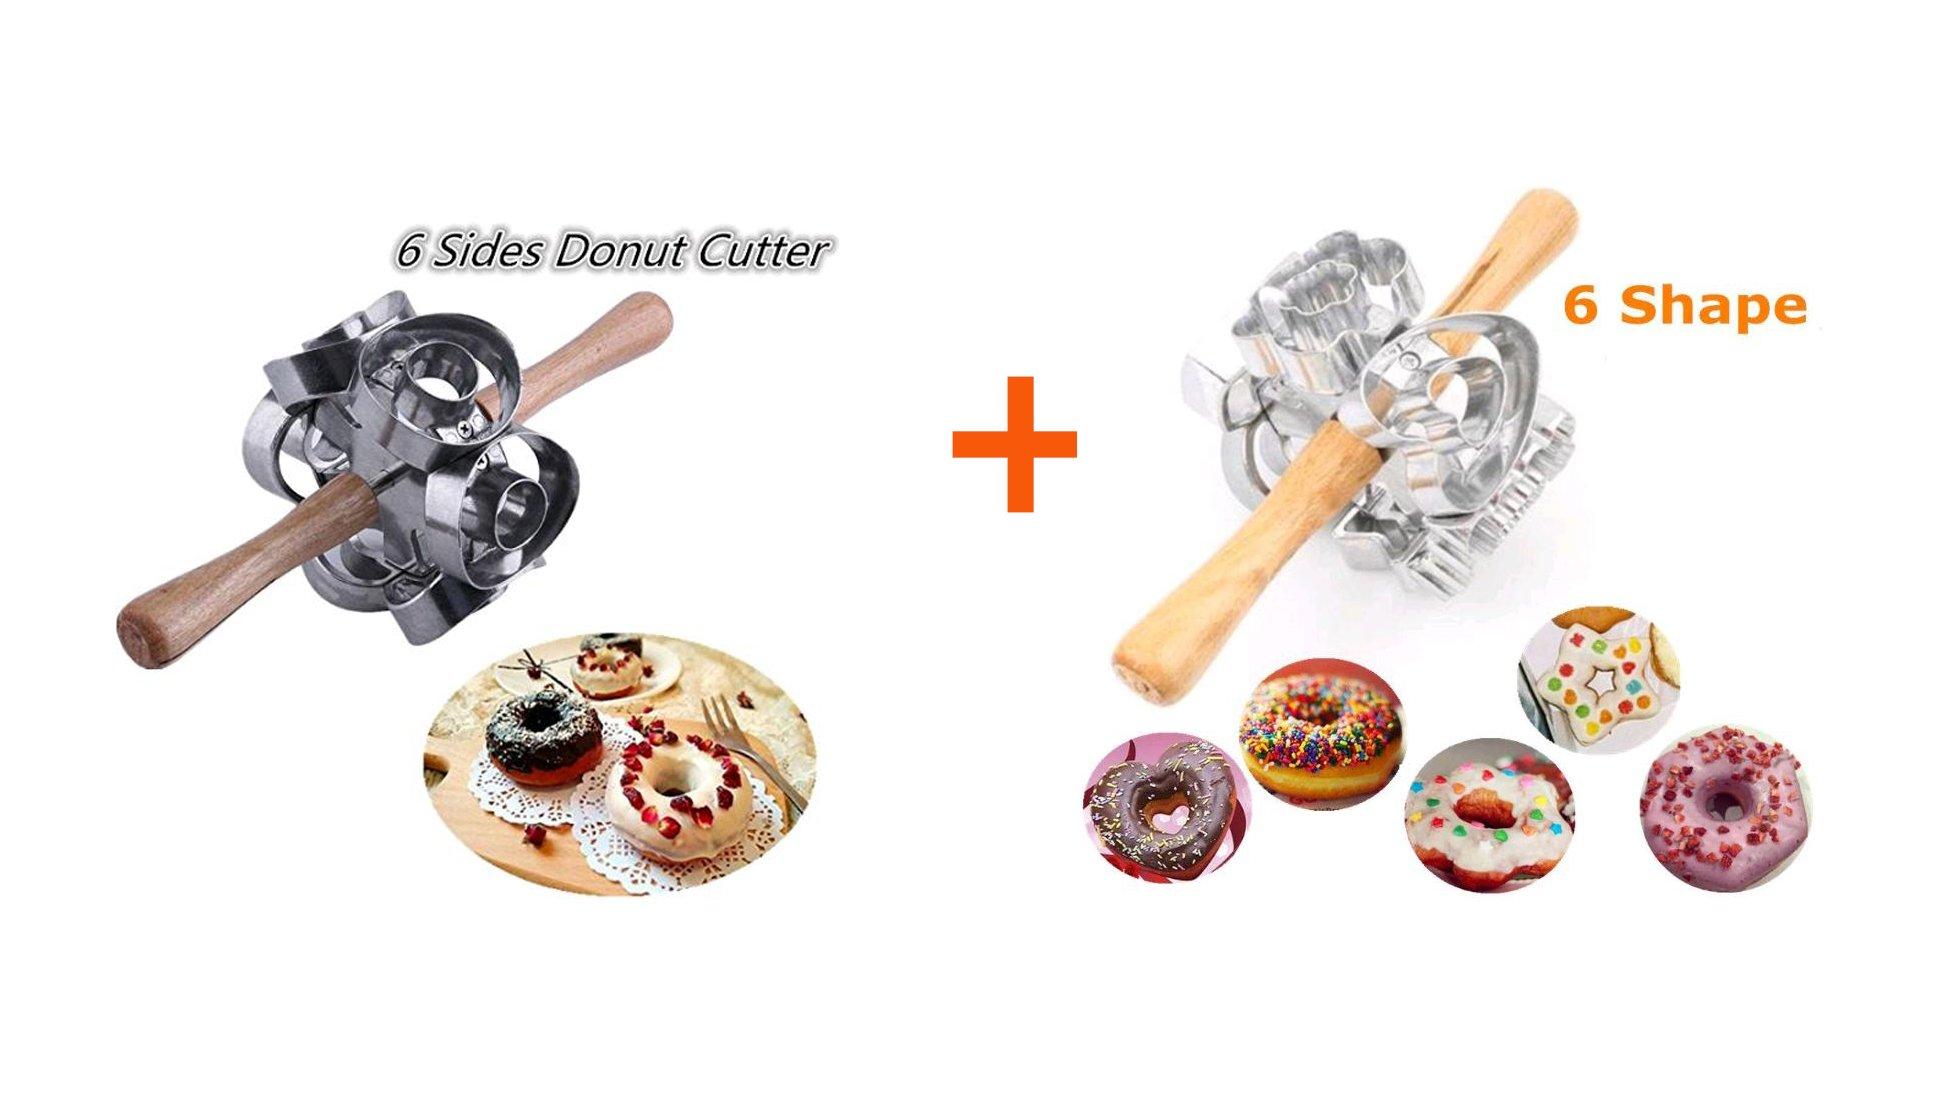 FCOZM 2 set Metal Revolving Donut Cutter Maker Machine Mold Pastry Dough Baking Roller For Cooking Baking